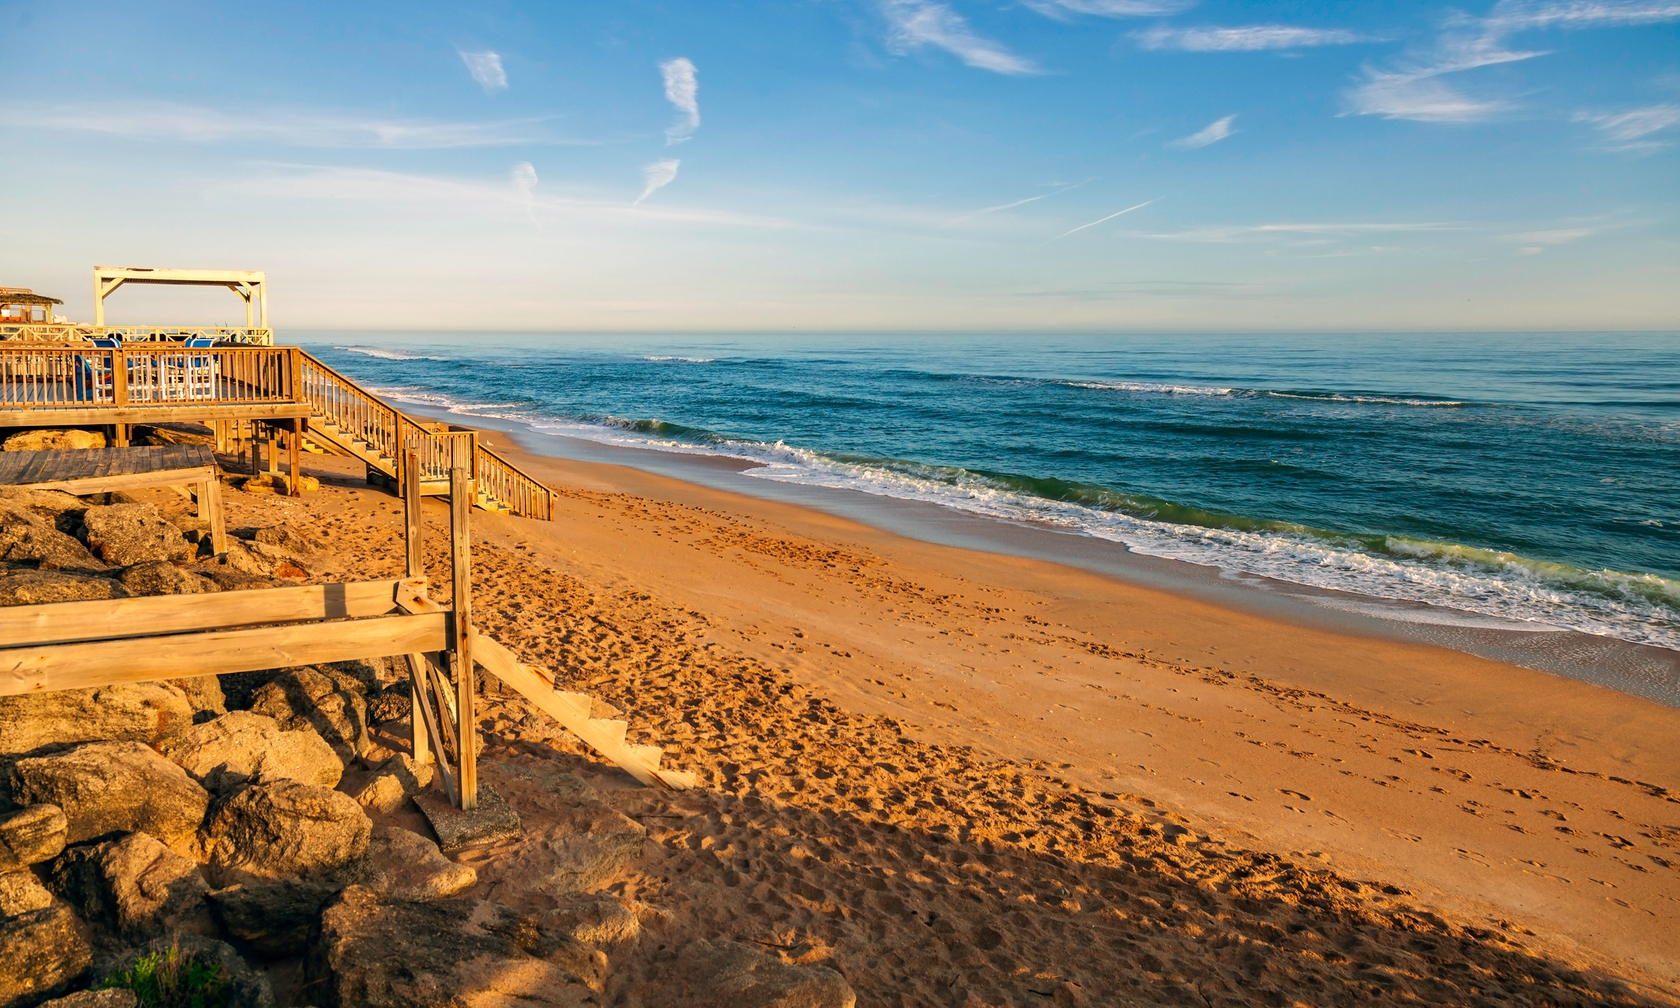 Vacation rental condos in New Smyrna Beach